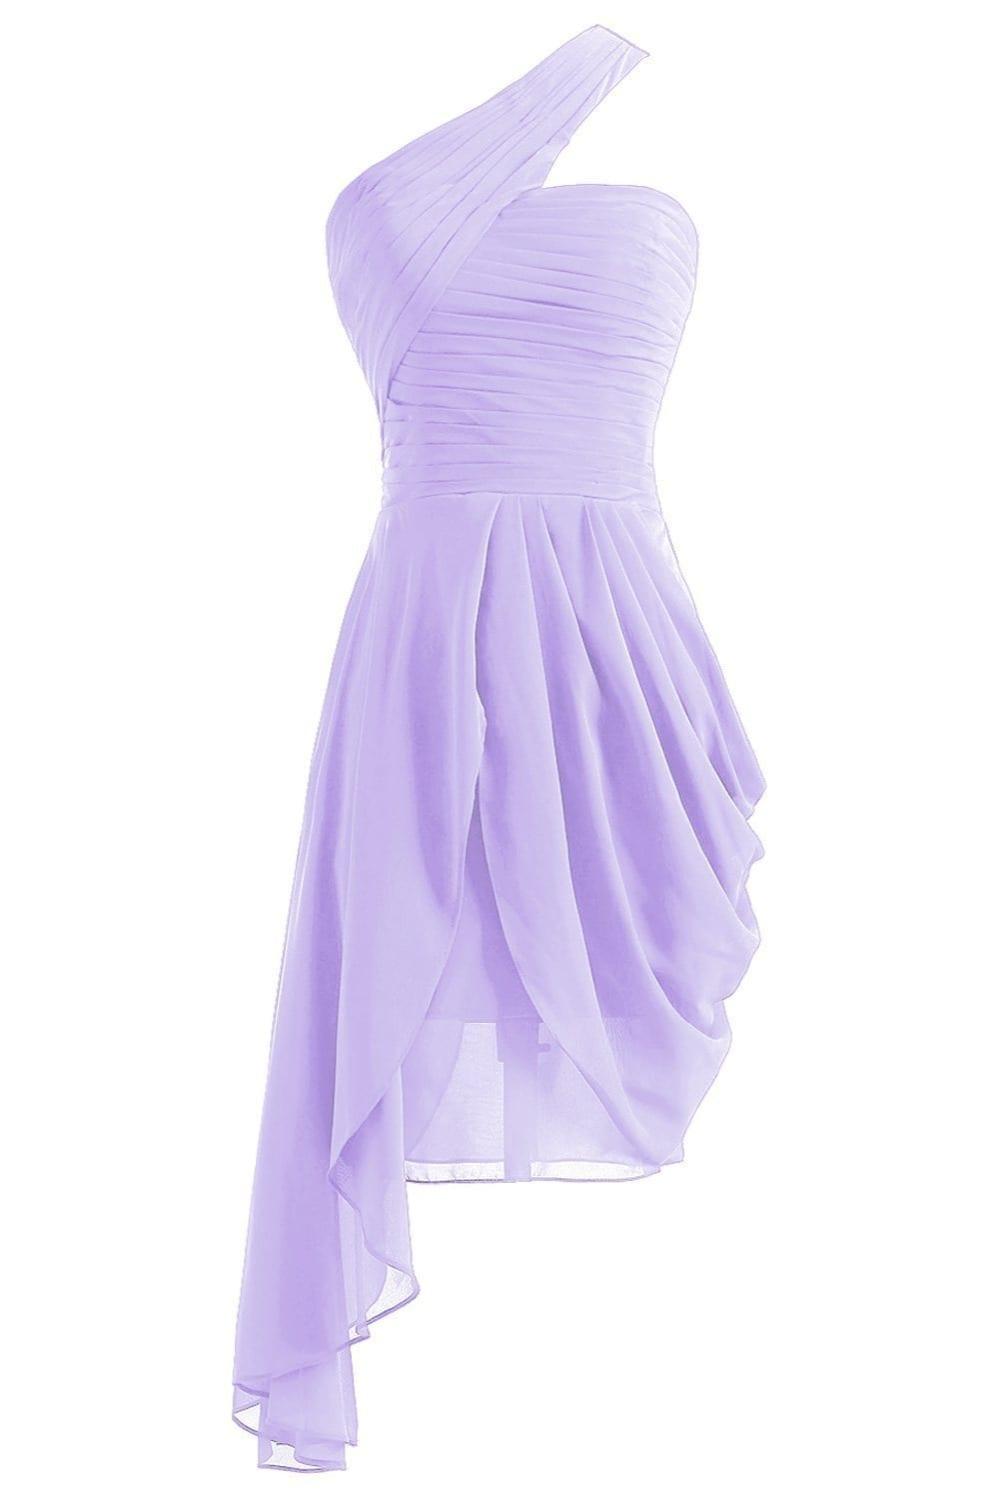 Elegant Sleeveless Knee Length Short Chiffon Bridesmaid Dress